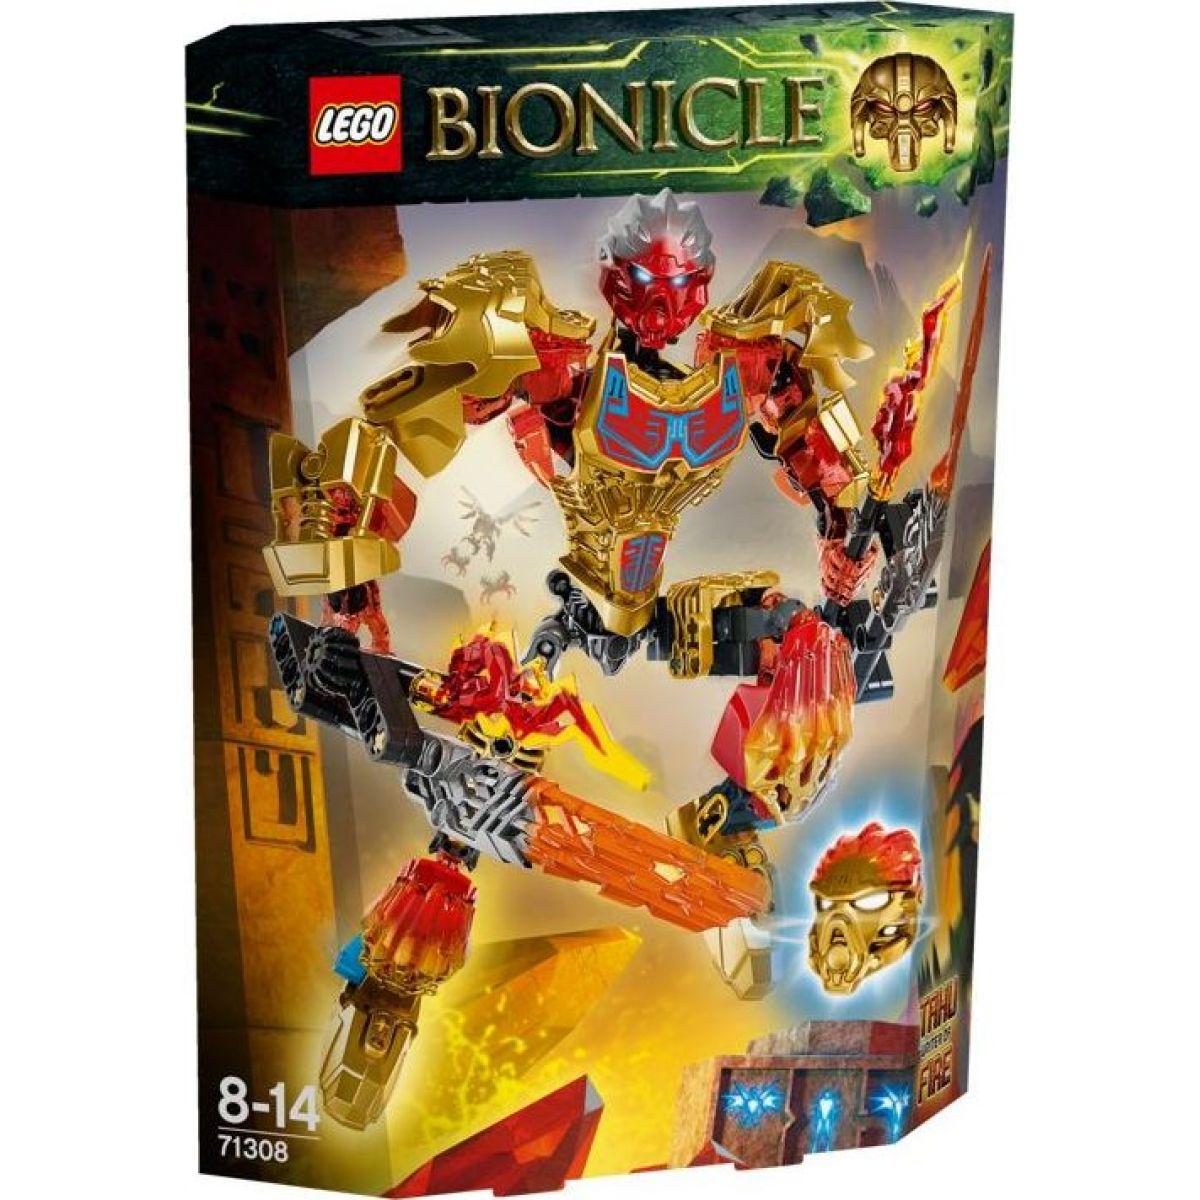 LEGO Bionicle 71308 Tahu Sjednotitel ohně